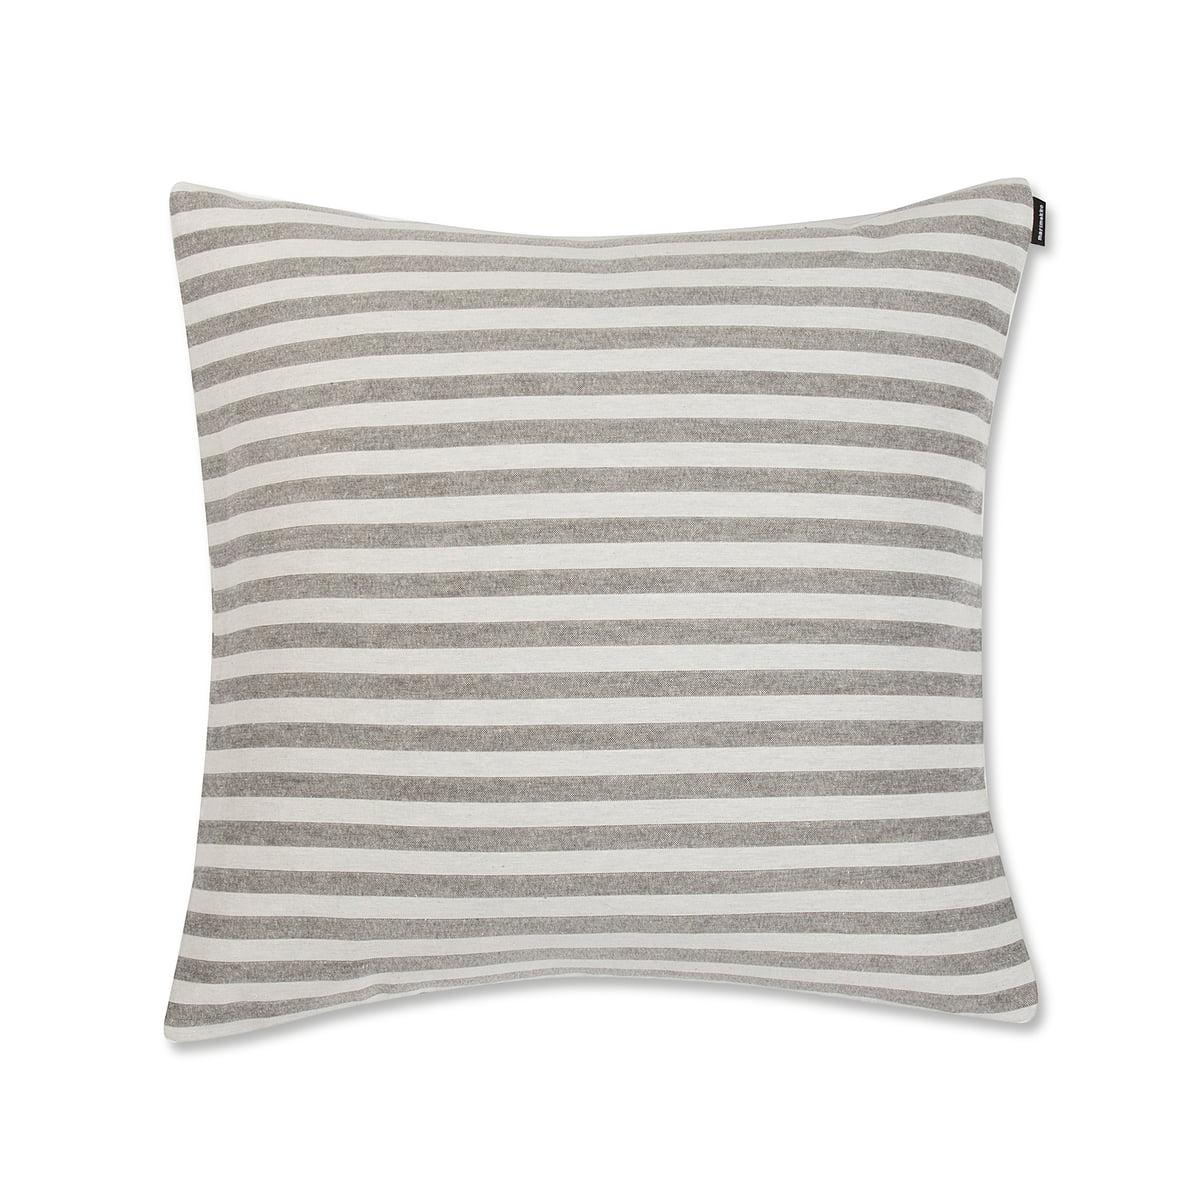 Tasaraita Cushion Cover By Marimekko Connox